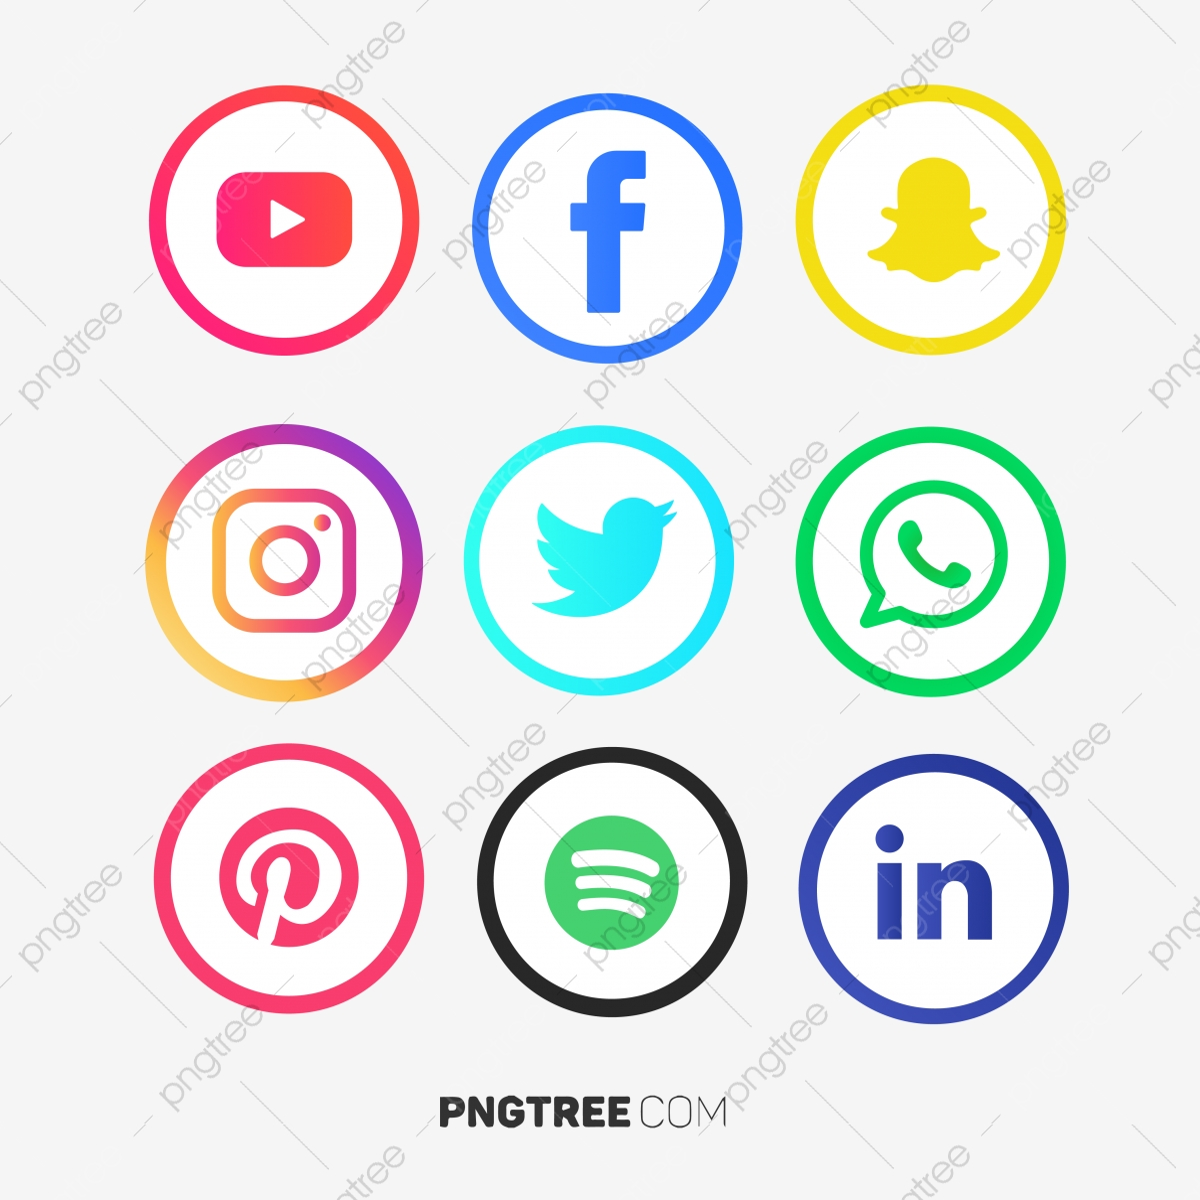 Vectores Redes Sociales Png